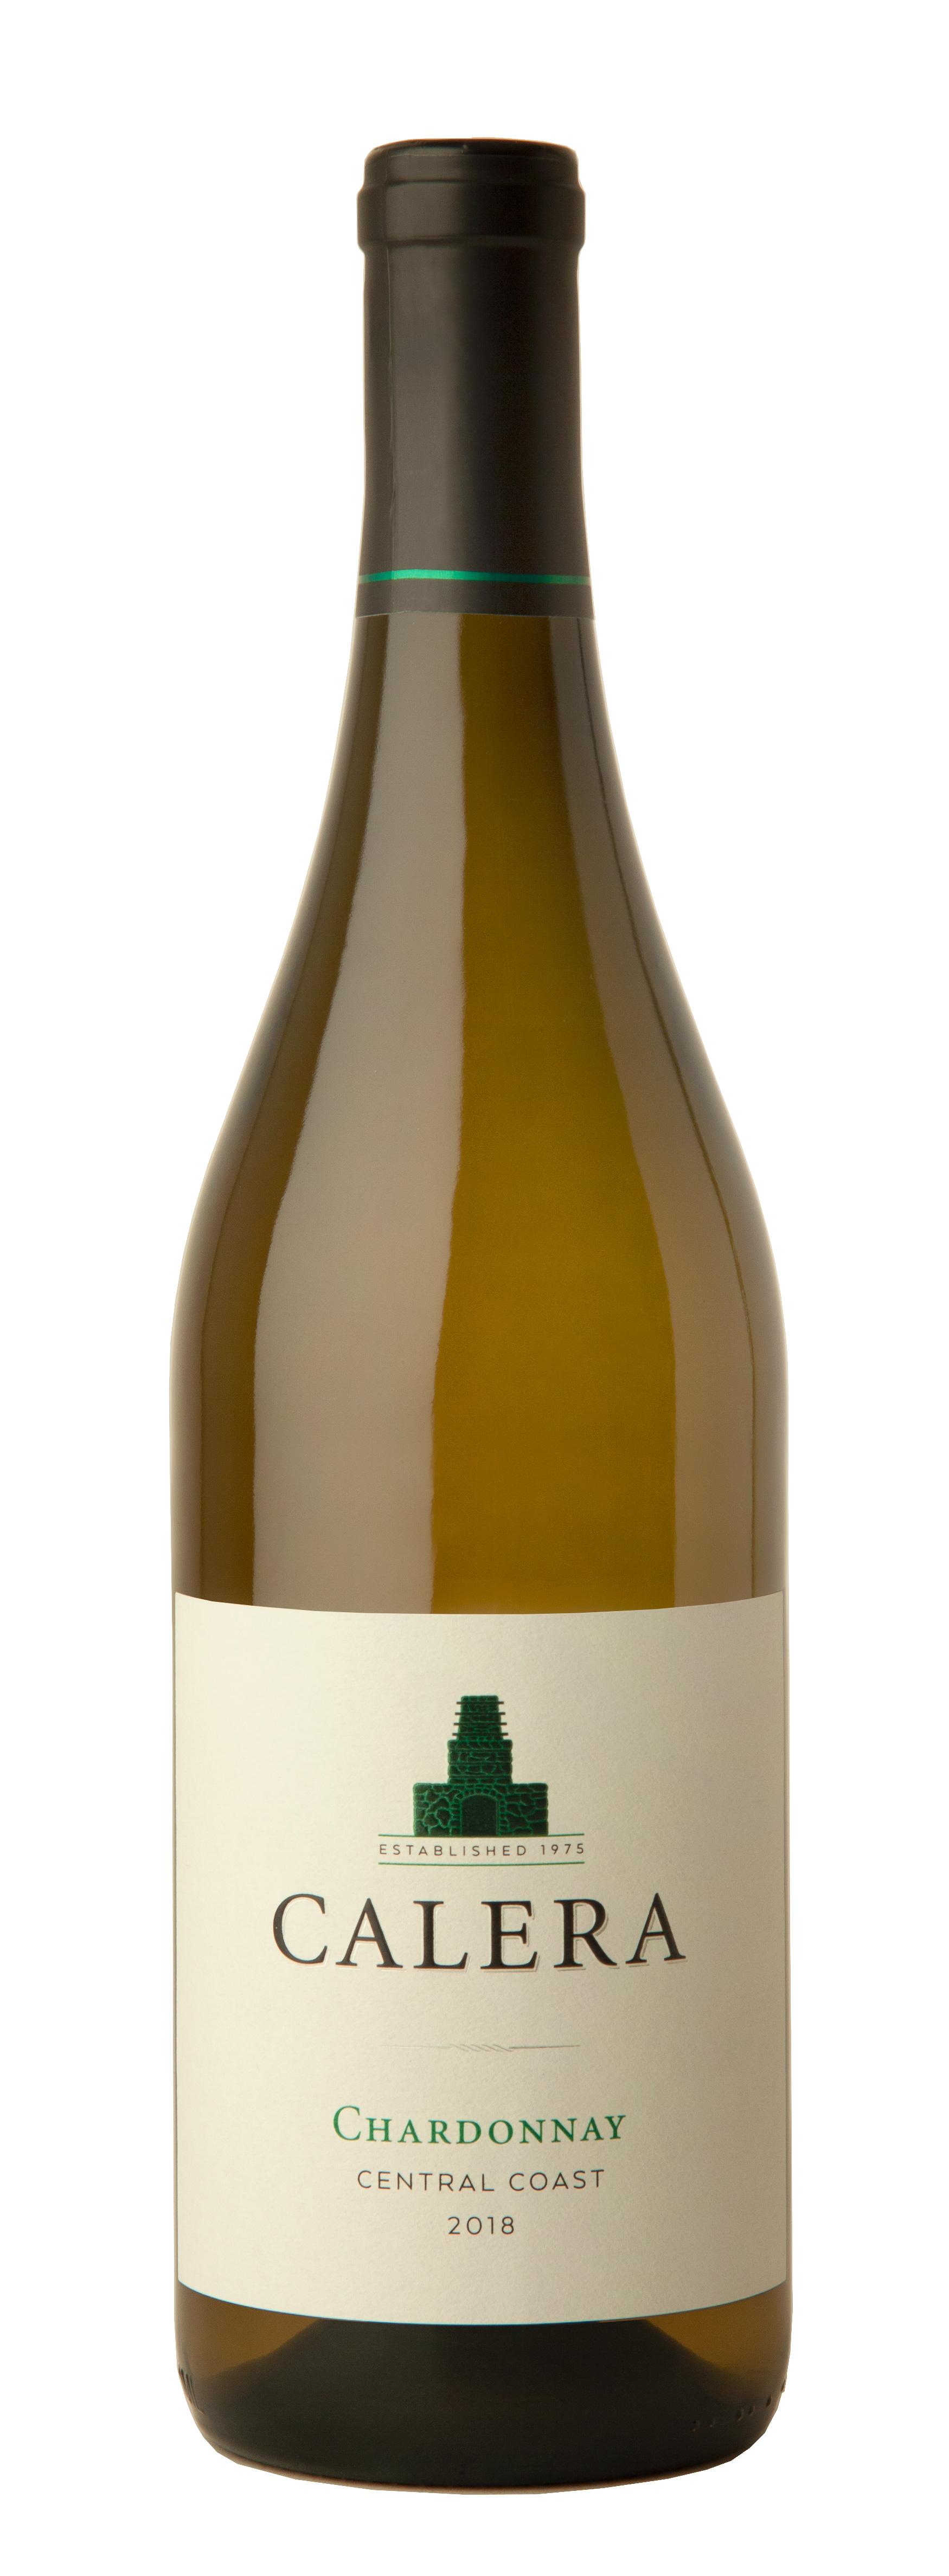 Calera Central Coast Chardonnay